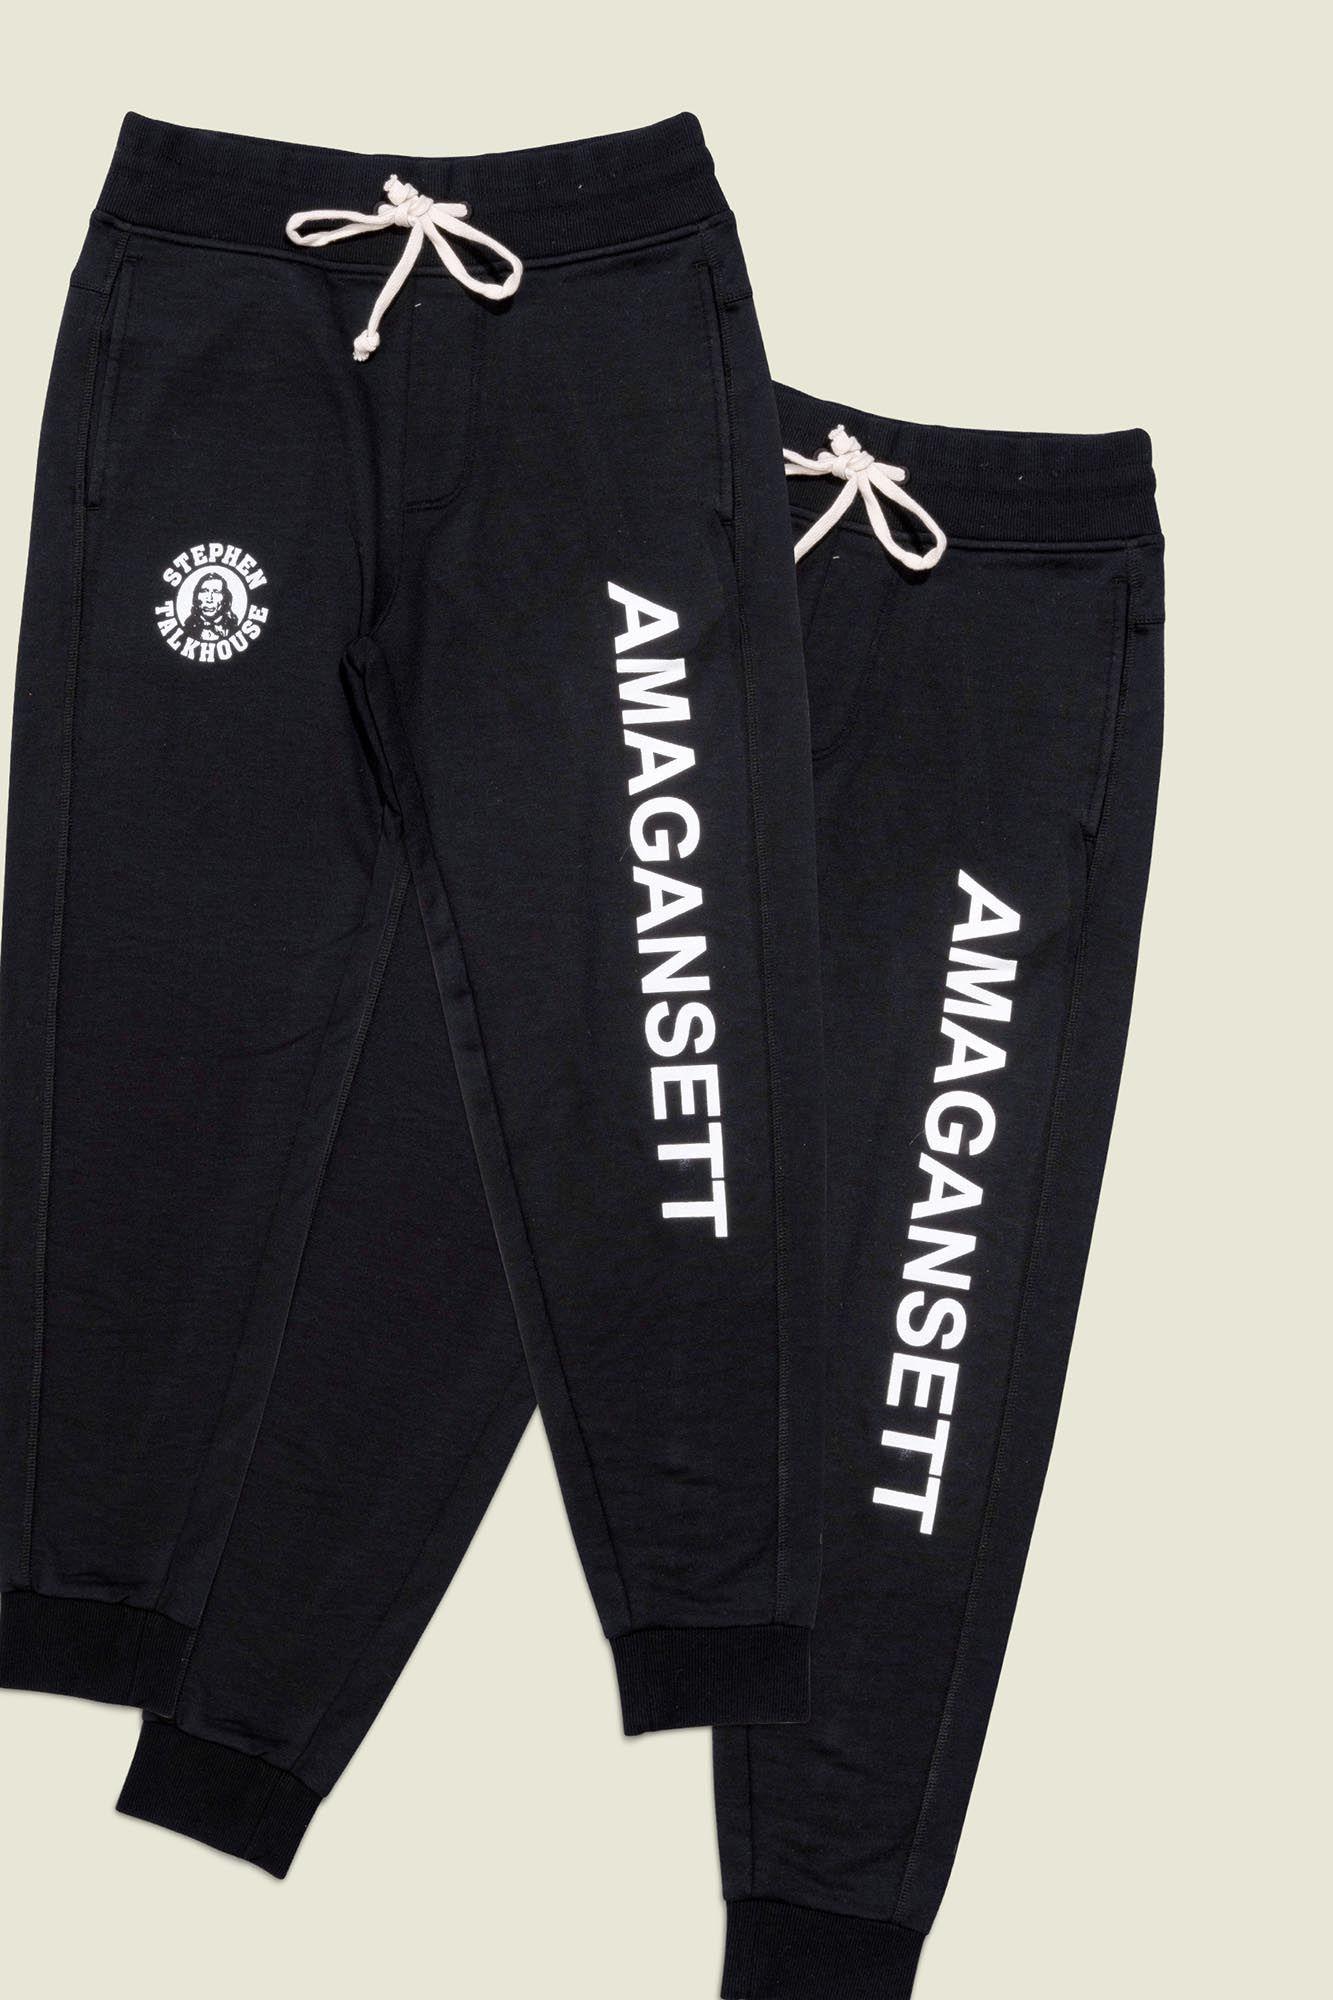 Set of black sweatpants